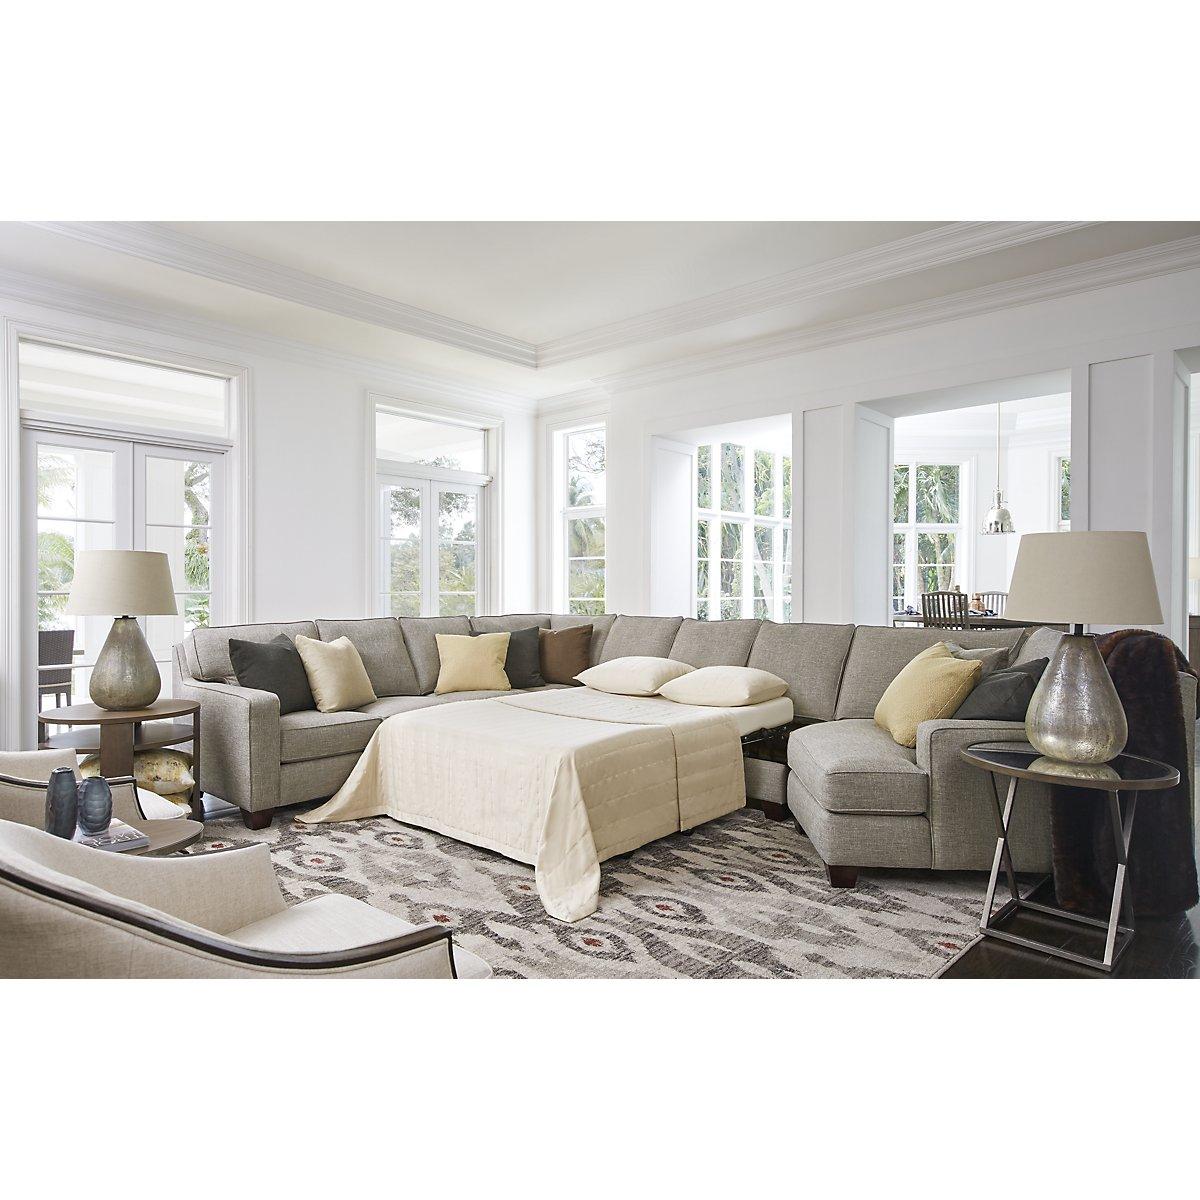 City Furniture: York Pewter Fabric Large Right Cuddler Memory Foam ...